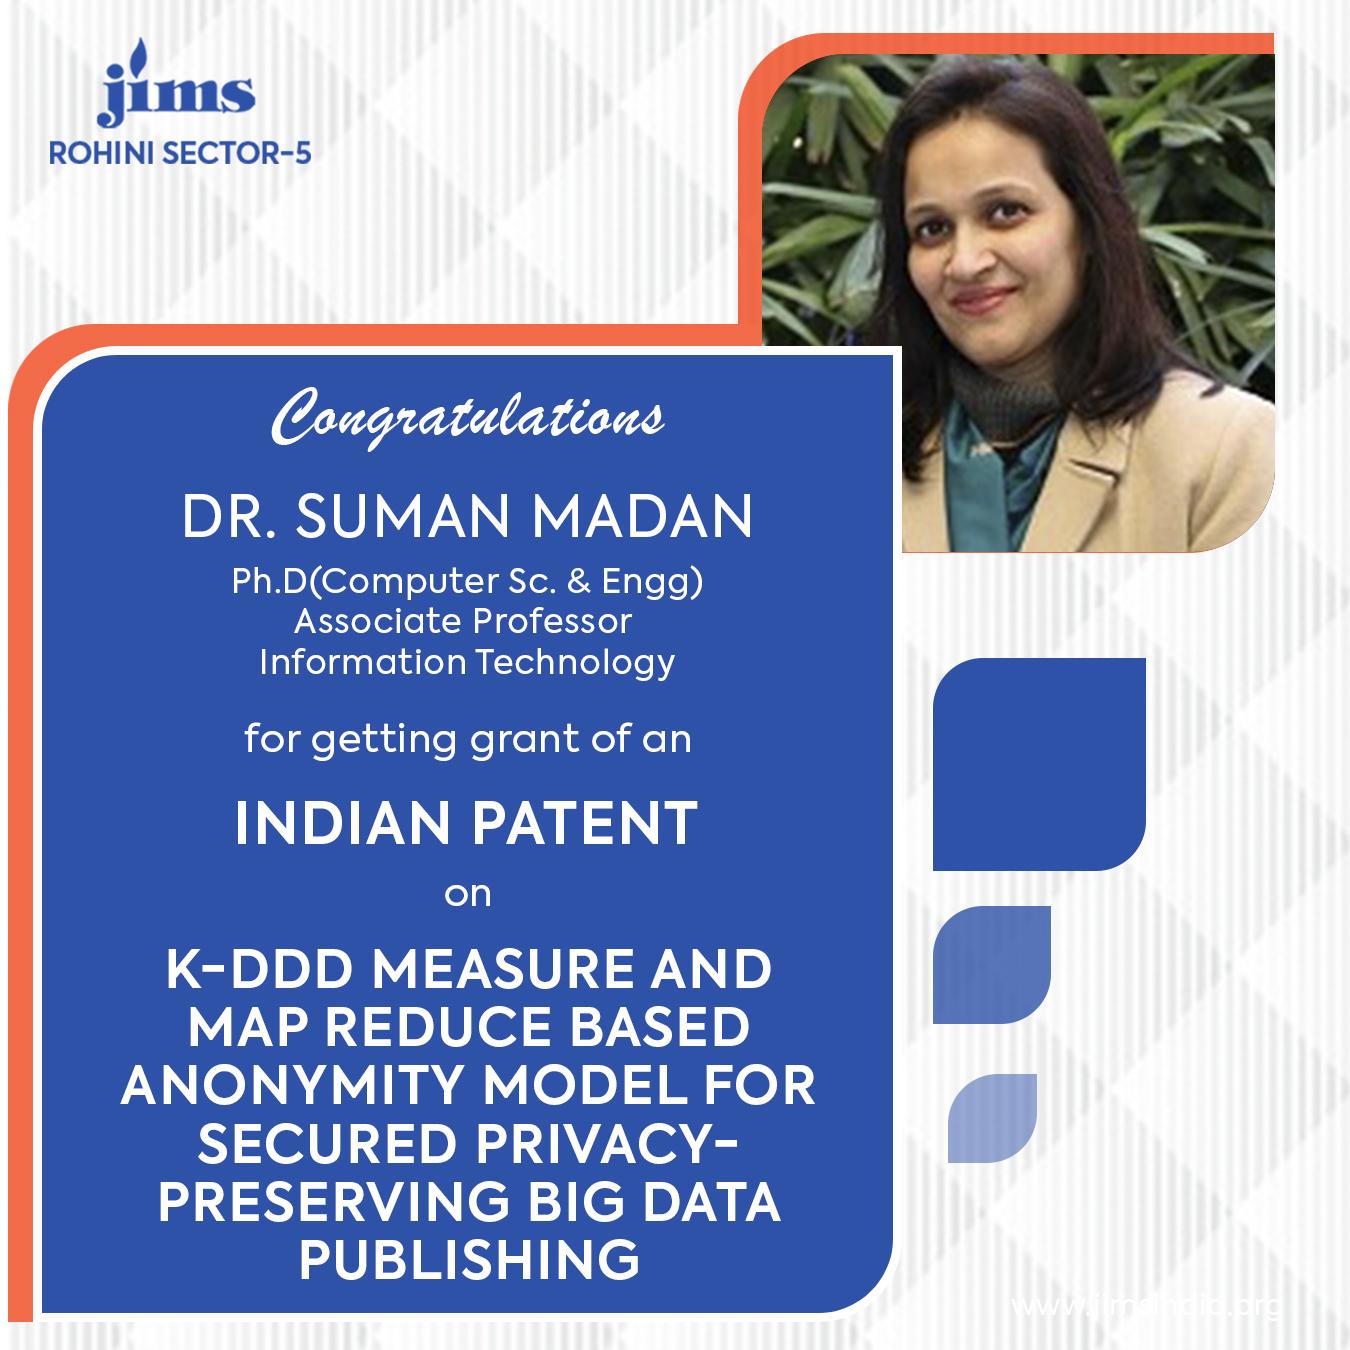 Indian Patent Dr. Suman Madan JIMS Rohini